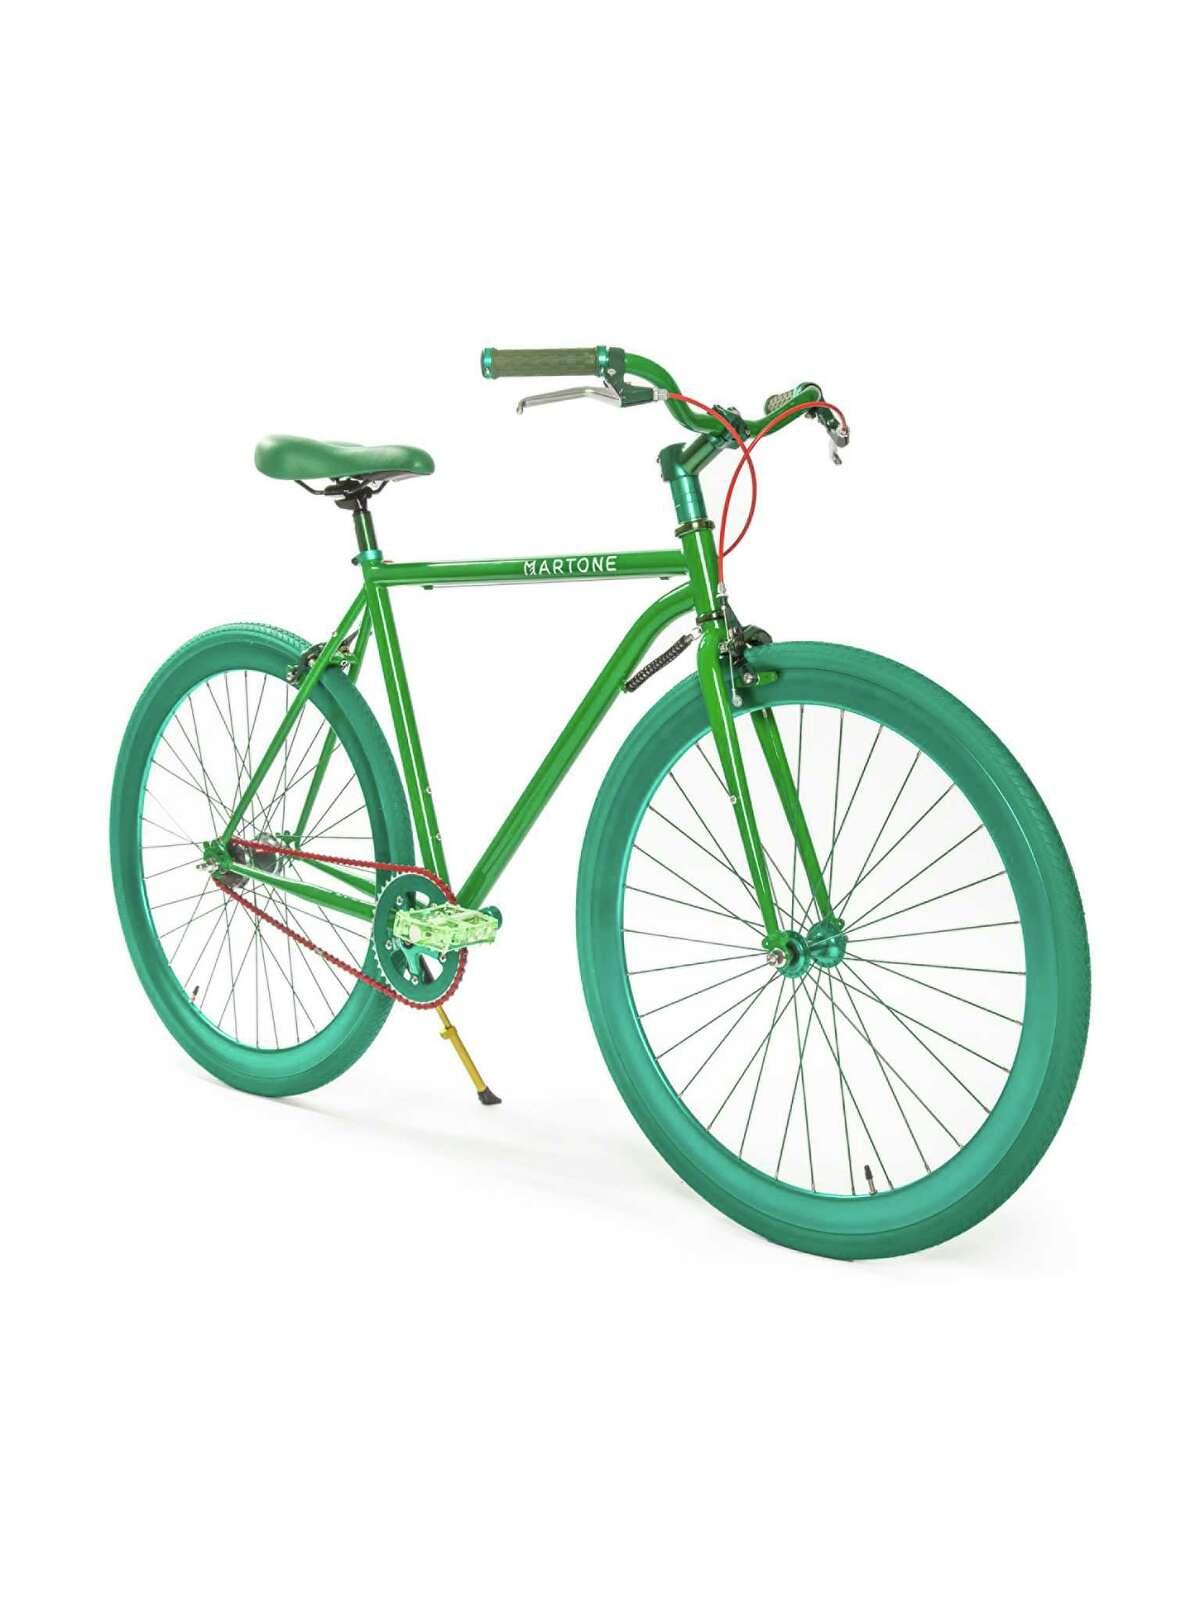 Martone Cycling Co. Diana Diamond Bike; $1,100 at Saks Fifth Avenue